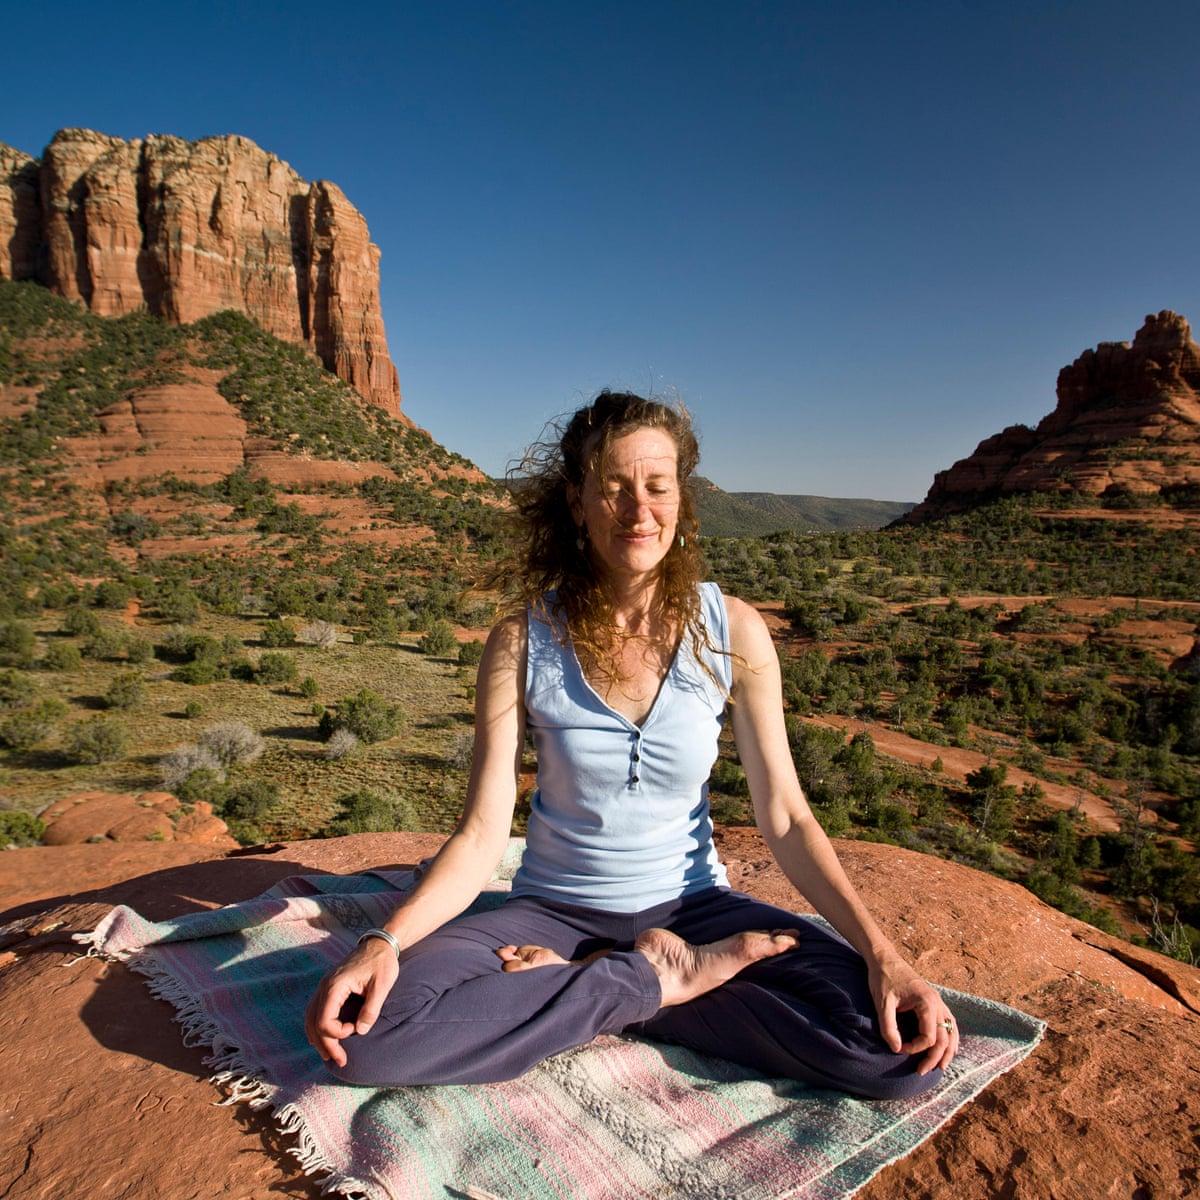 Spiritual Sedona The Arizona Town Bursting With Positive Vibes Travel The Guardian